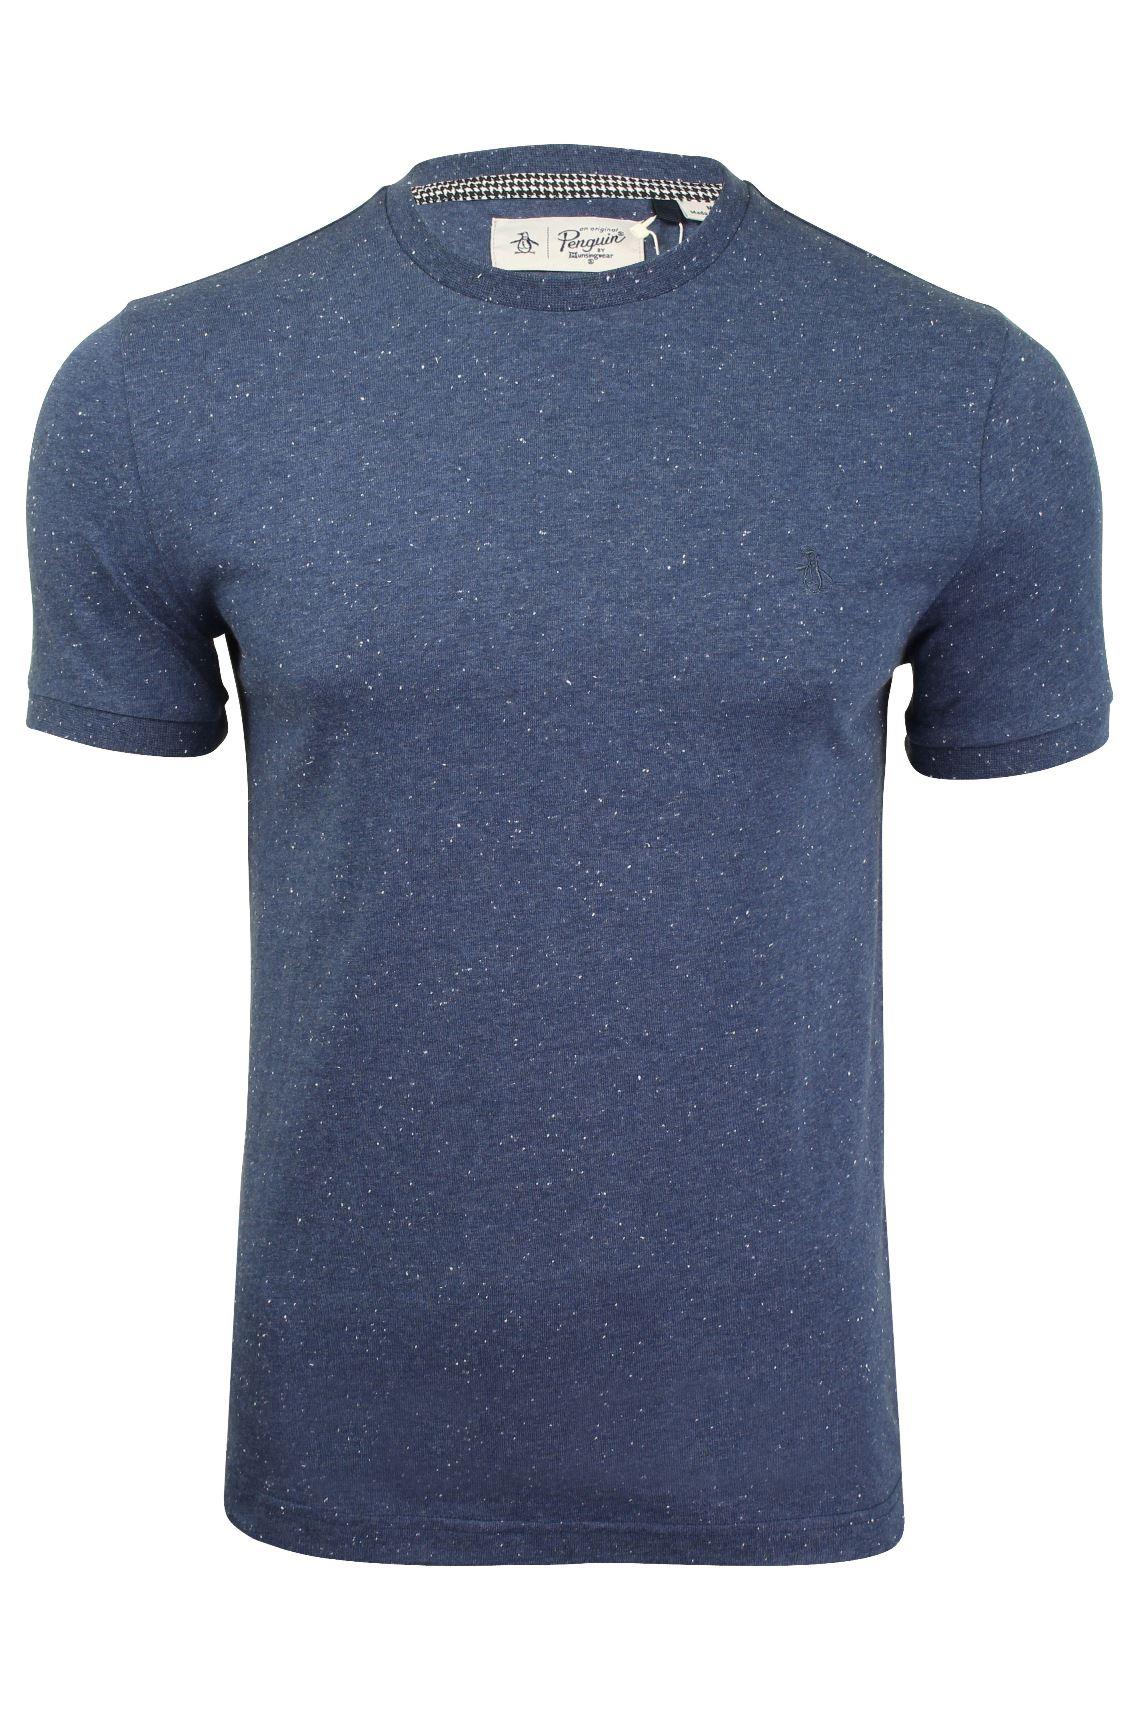 Mens-Nep-Maniche-corte-T-shirt-da-Original-Penguin